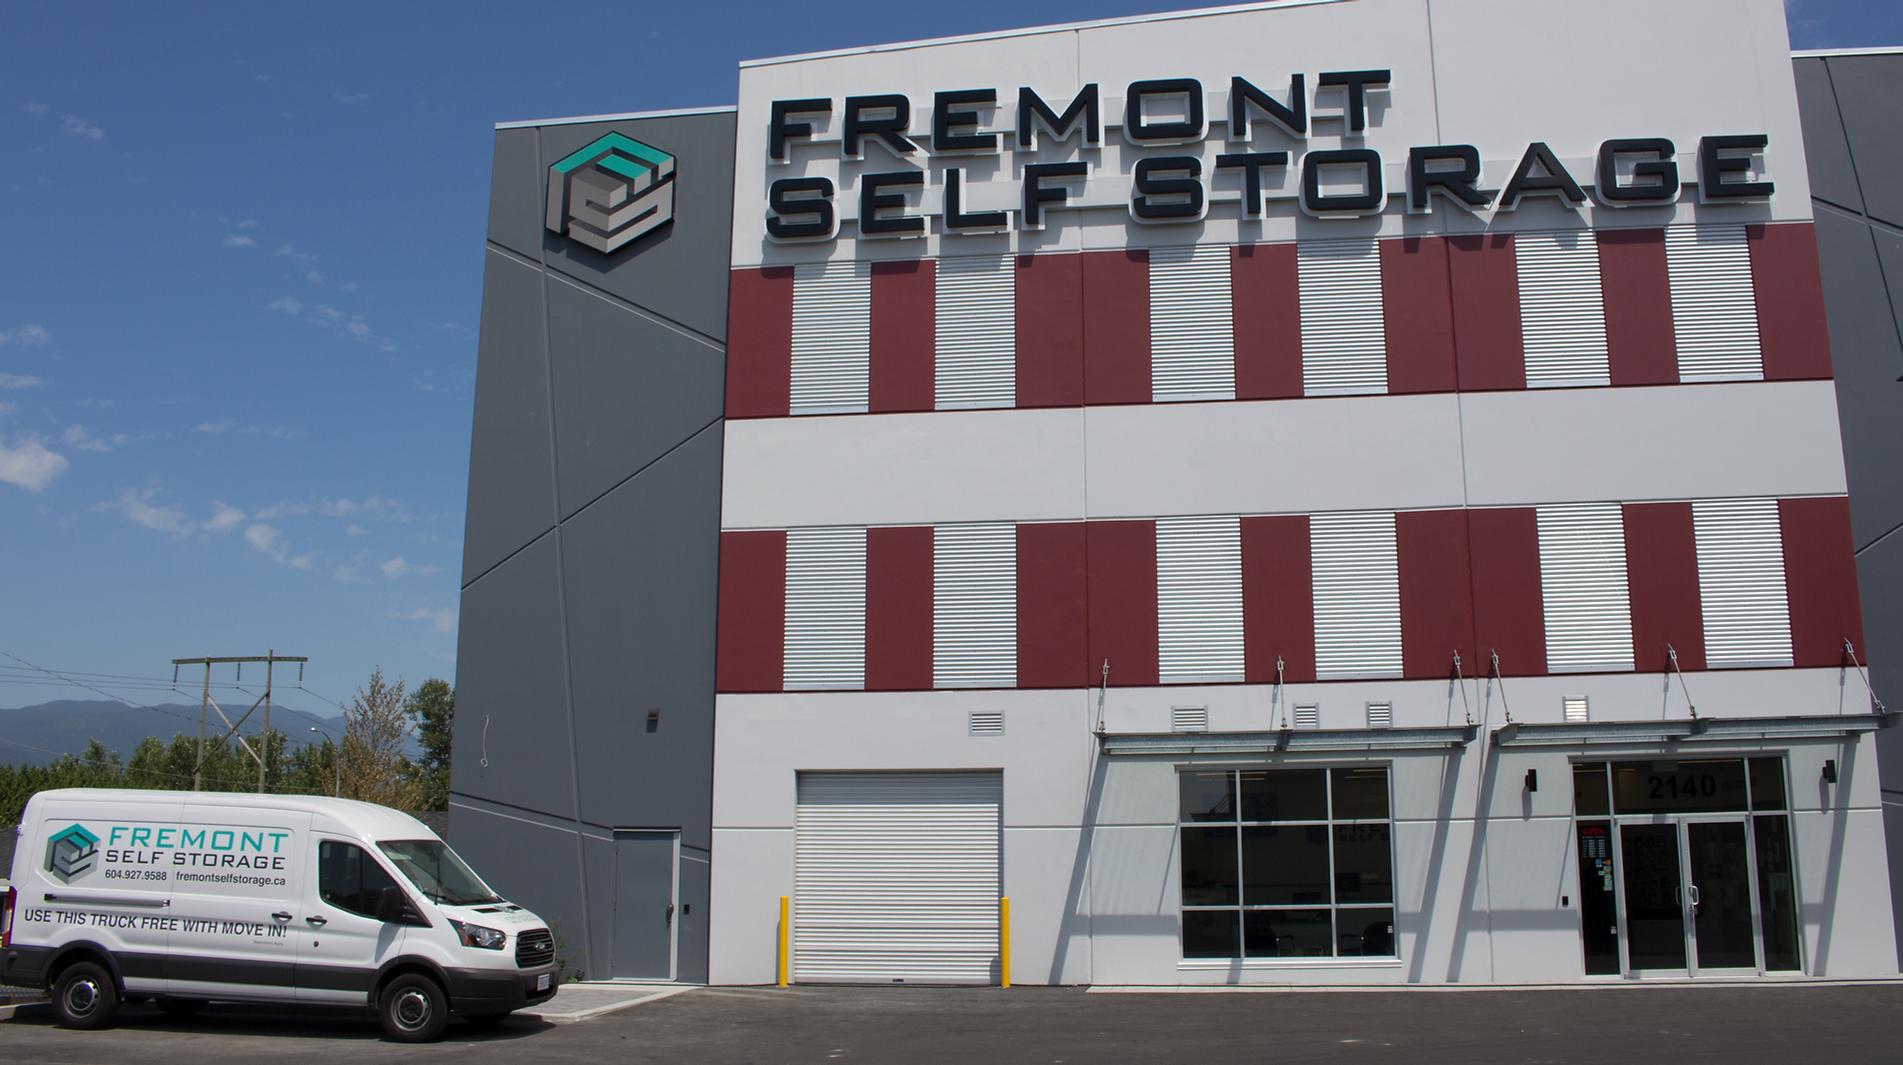 Amazing Fremont Self Storage Port Coquitlam | Storage Lockers U0026 Public Storage